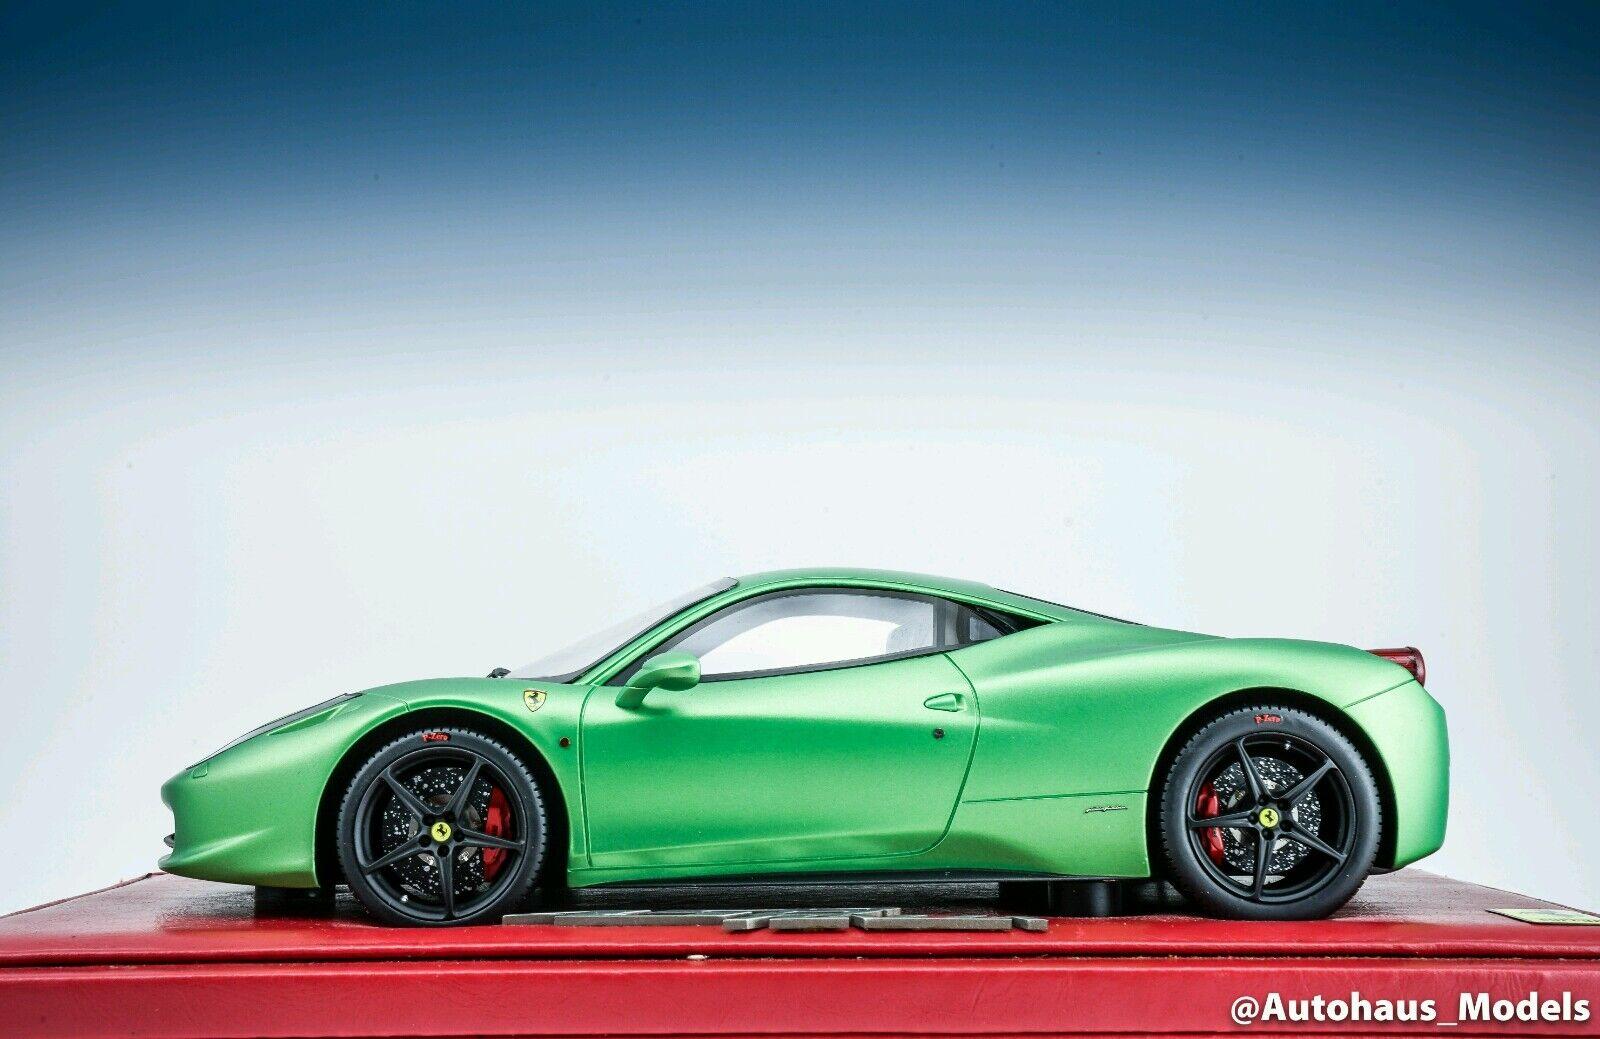 1:18 Bbr Ferrari  Italia Mate Verde Edición Limitada Rara